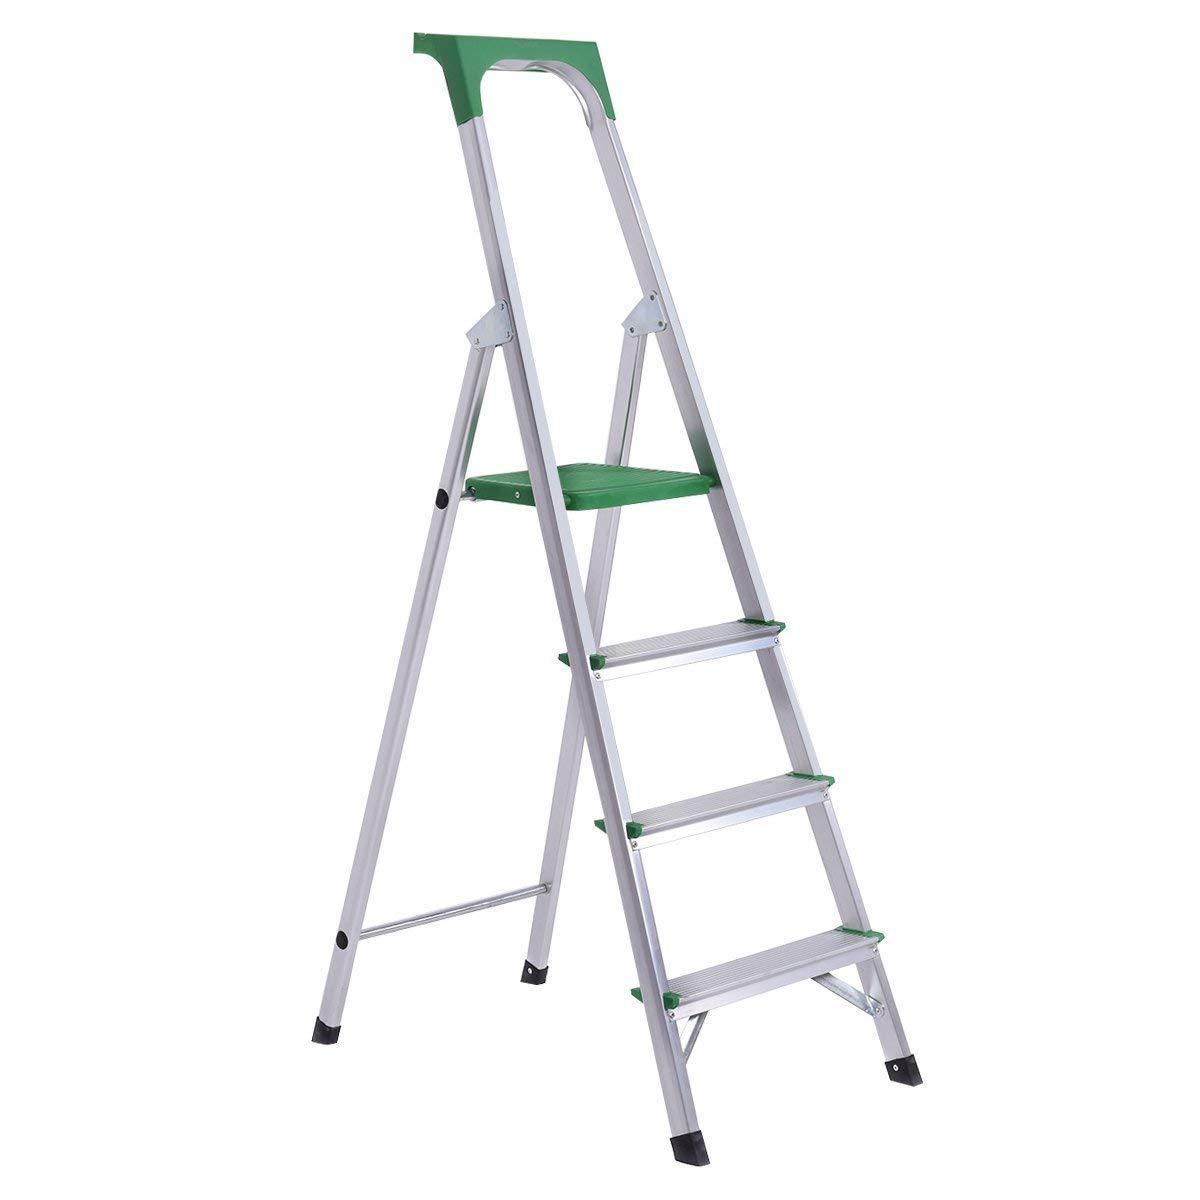 Giantex Folding 4 Step Ladder Aluminum Non-Slip Work Stool Platform 330Lbs Load Capacity, Green